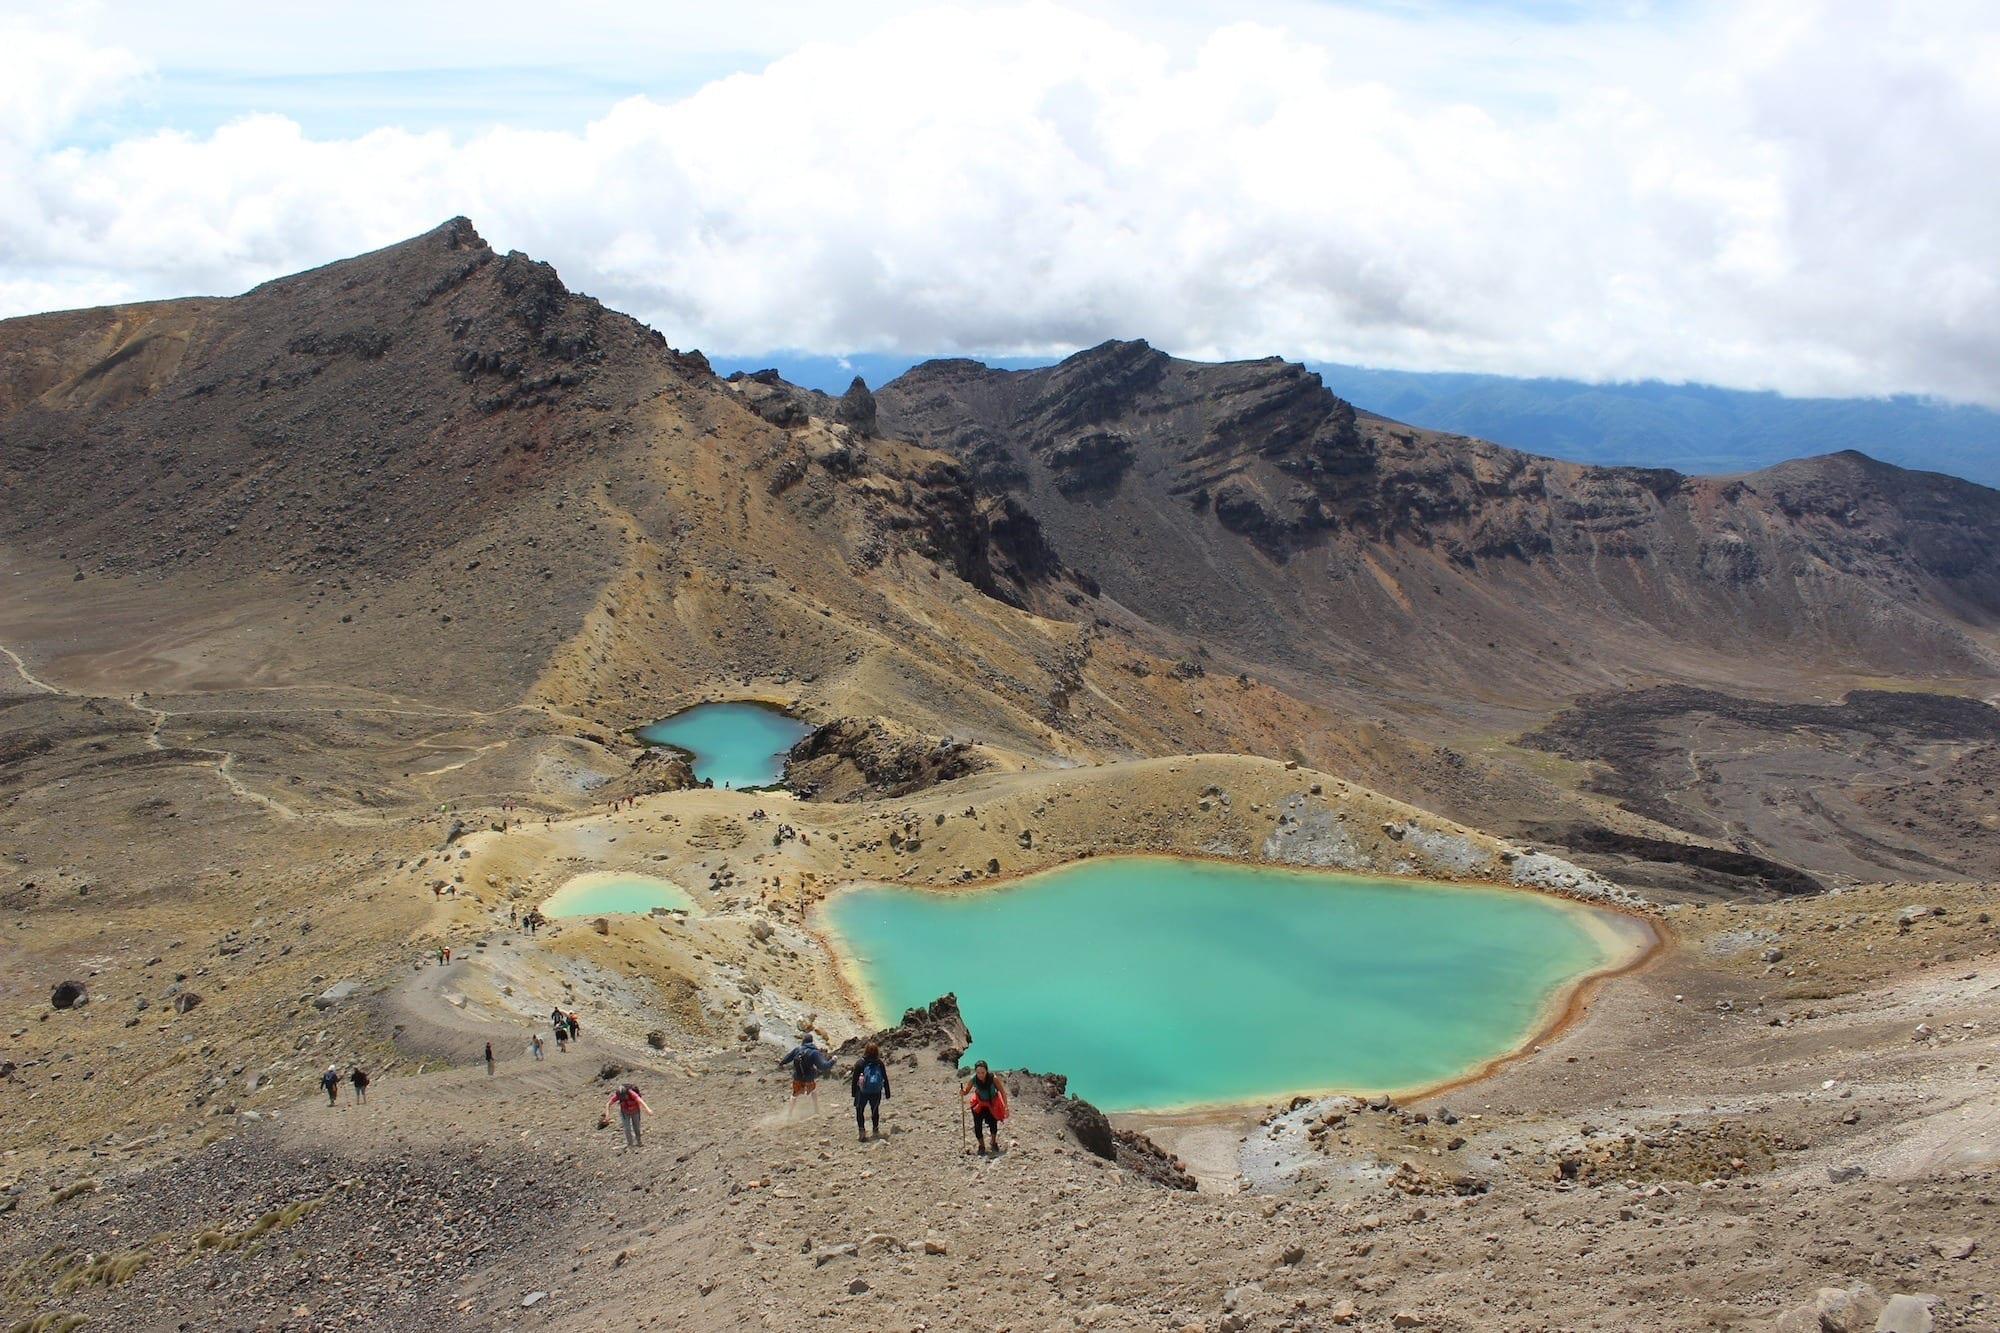 New Zealand's Best Day Hike: Tongariro Crossing Hiking Guide